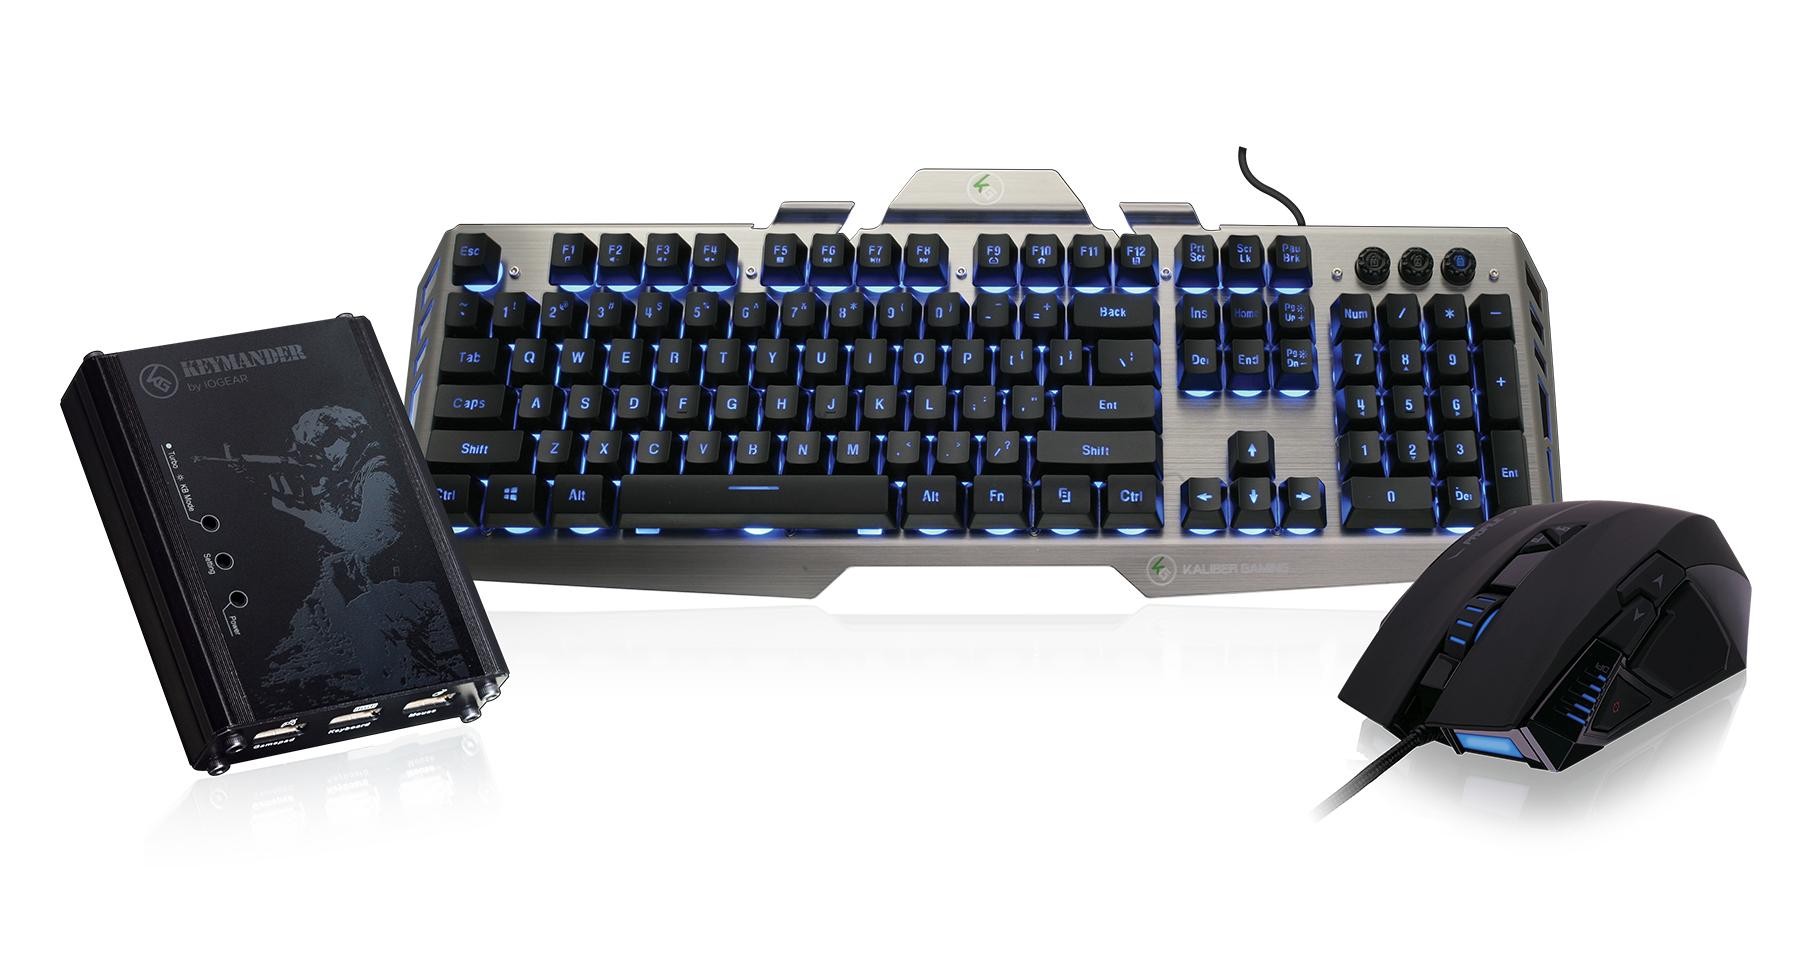 IOGEAR - GE1337PKIT2 - KeyMander Performance Keyboard